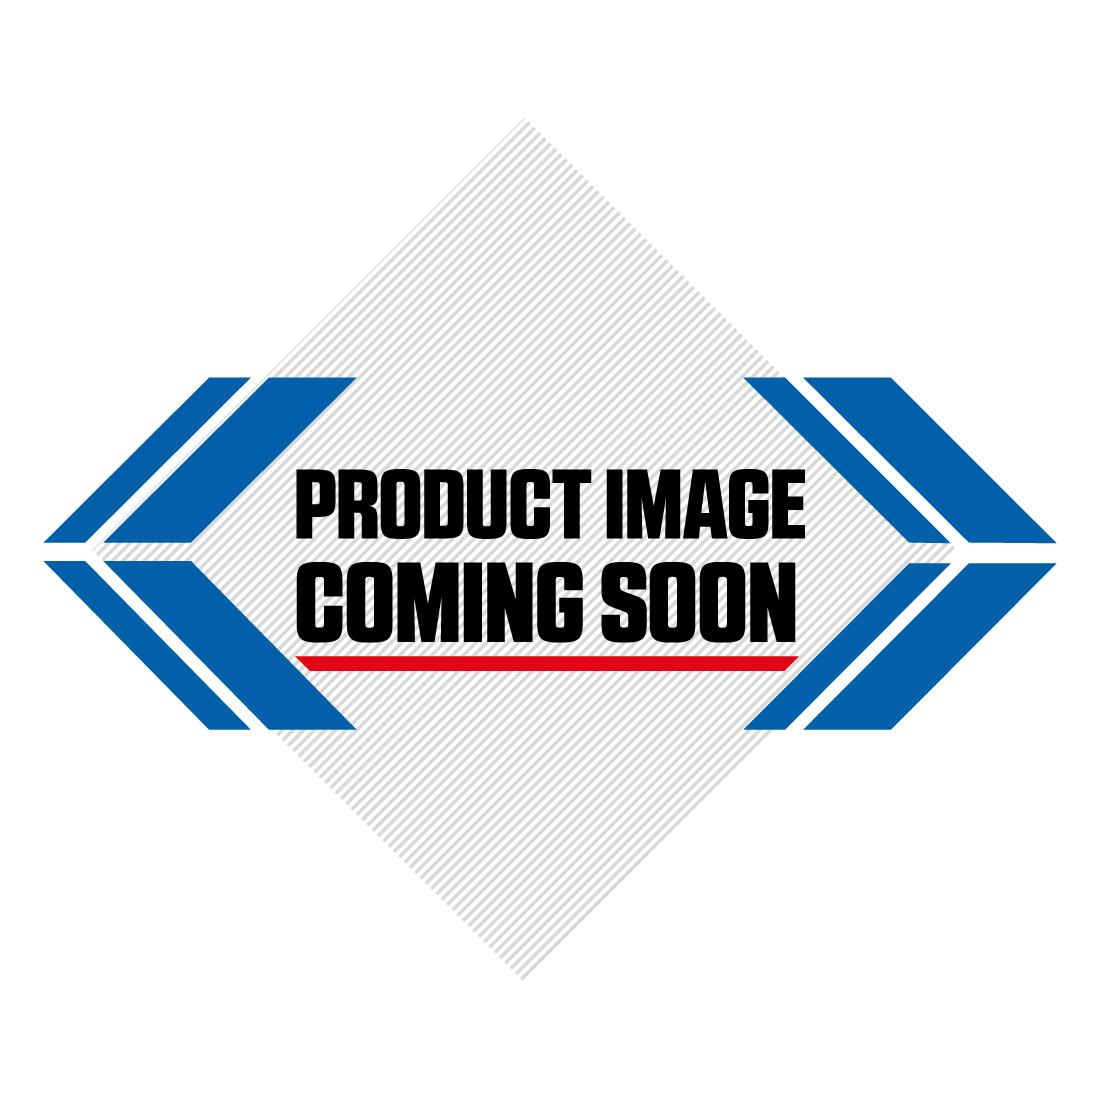 Honda Plastic Kit CRF 230 (08-14) OEM Factory Image-1